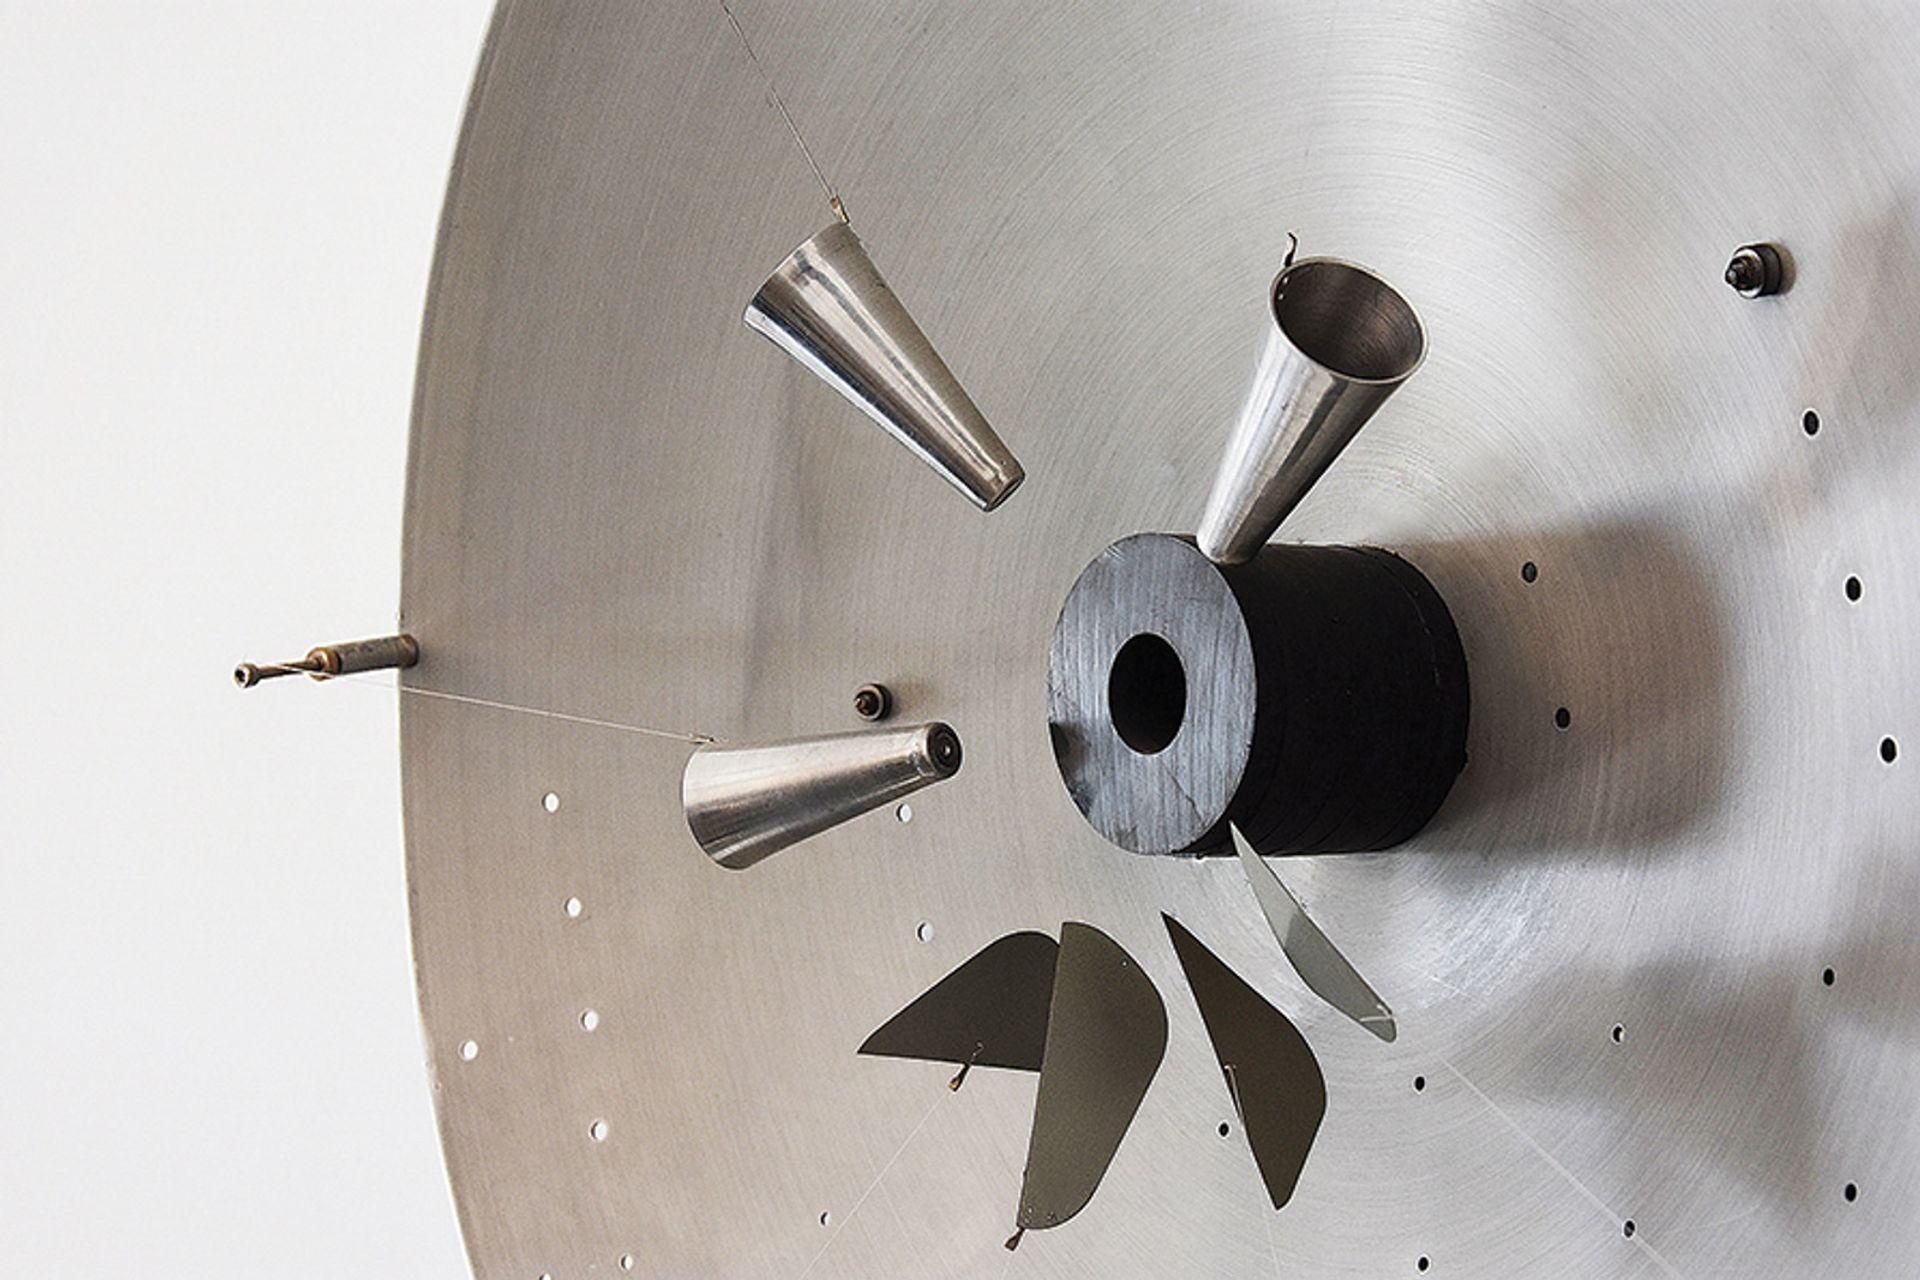 Radar (1960) demonstrates Takis's fascination with magnetics Photo: Fay Zervos, © ADAGP, Paris and DACS